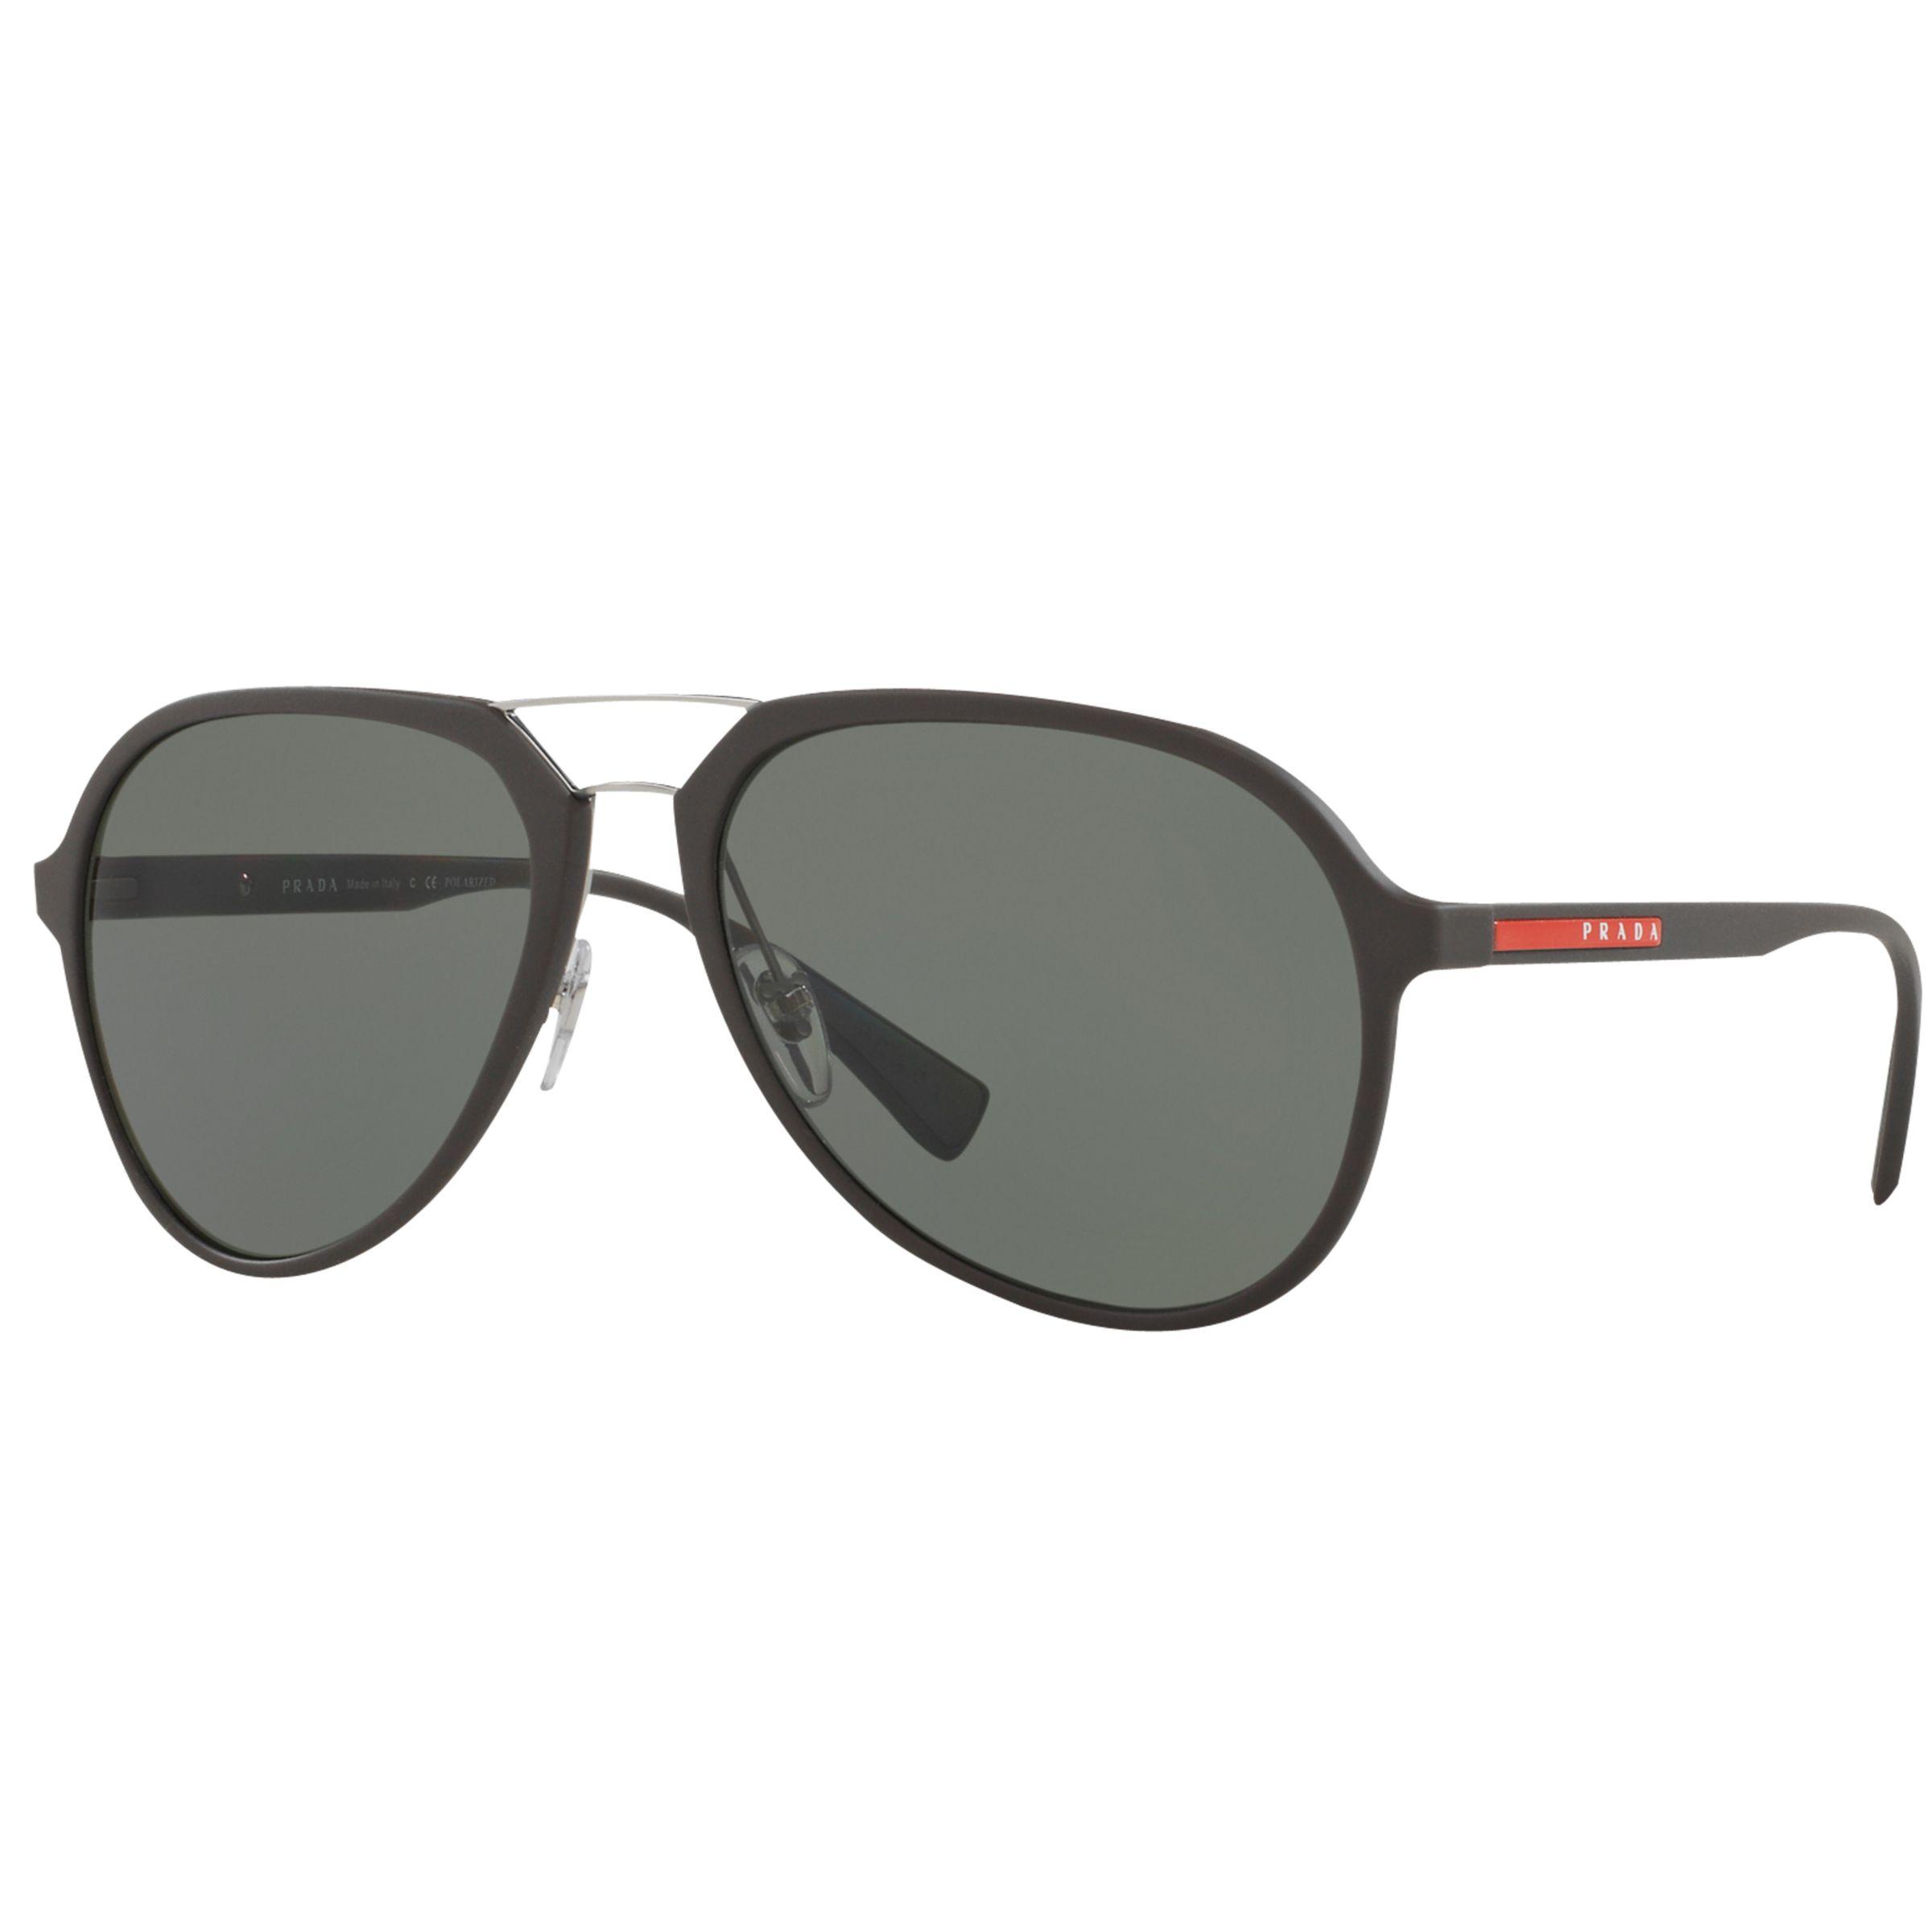 Prada Linea Rossa Prada Linea Rossa PS 05RS Polarised Aviator Sunglasses, Dark Brown/Green